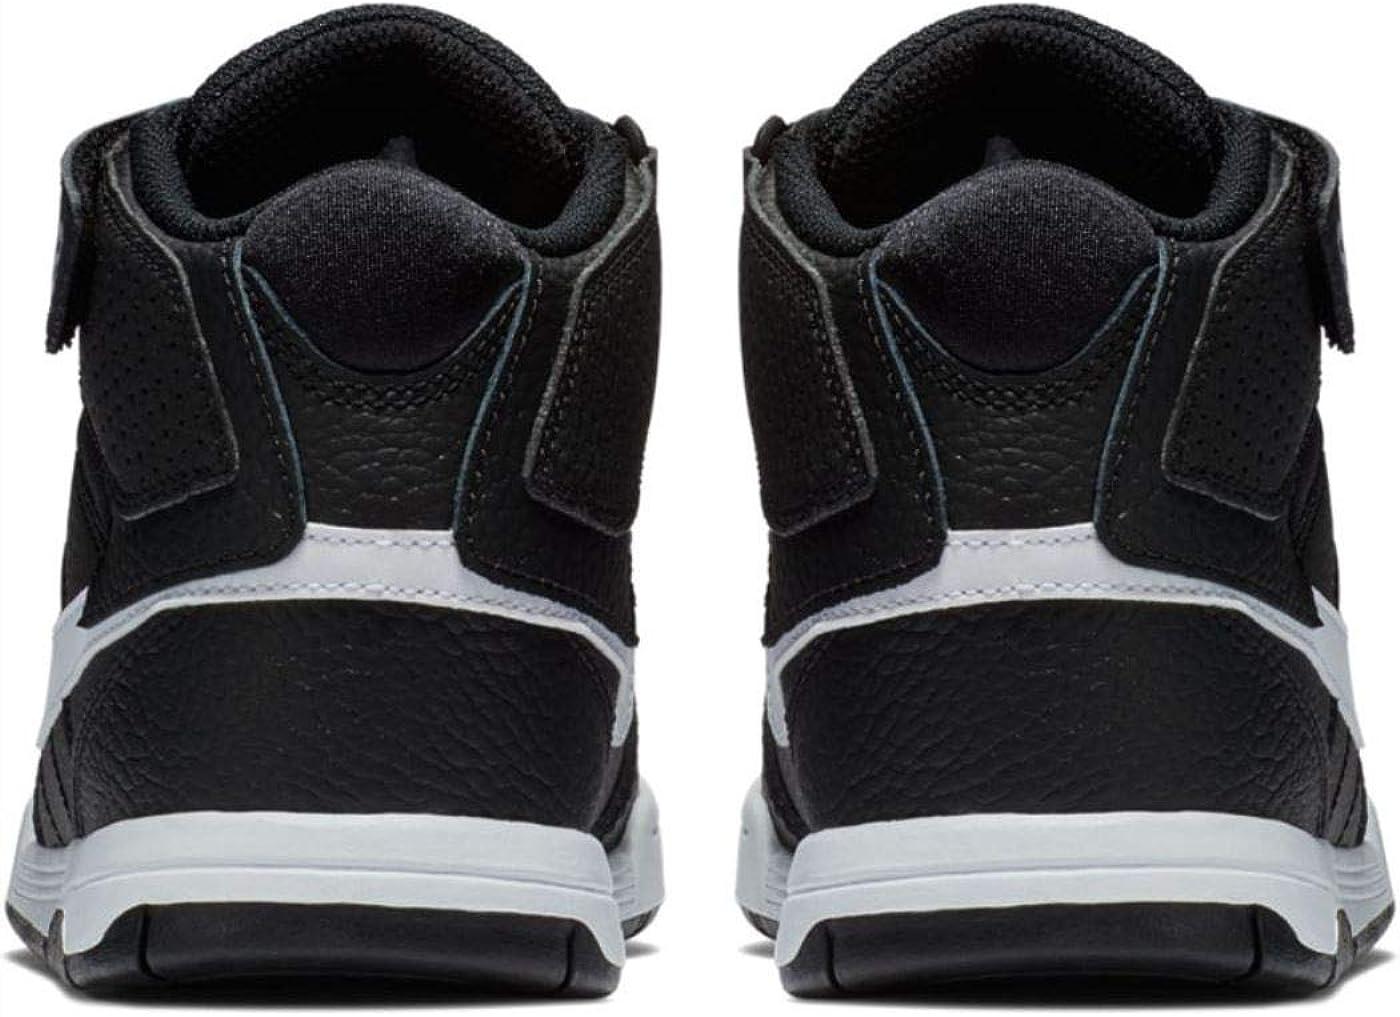 Baskets Hautes Gar/çon Nike Mogan Mid 2 Jr B